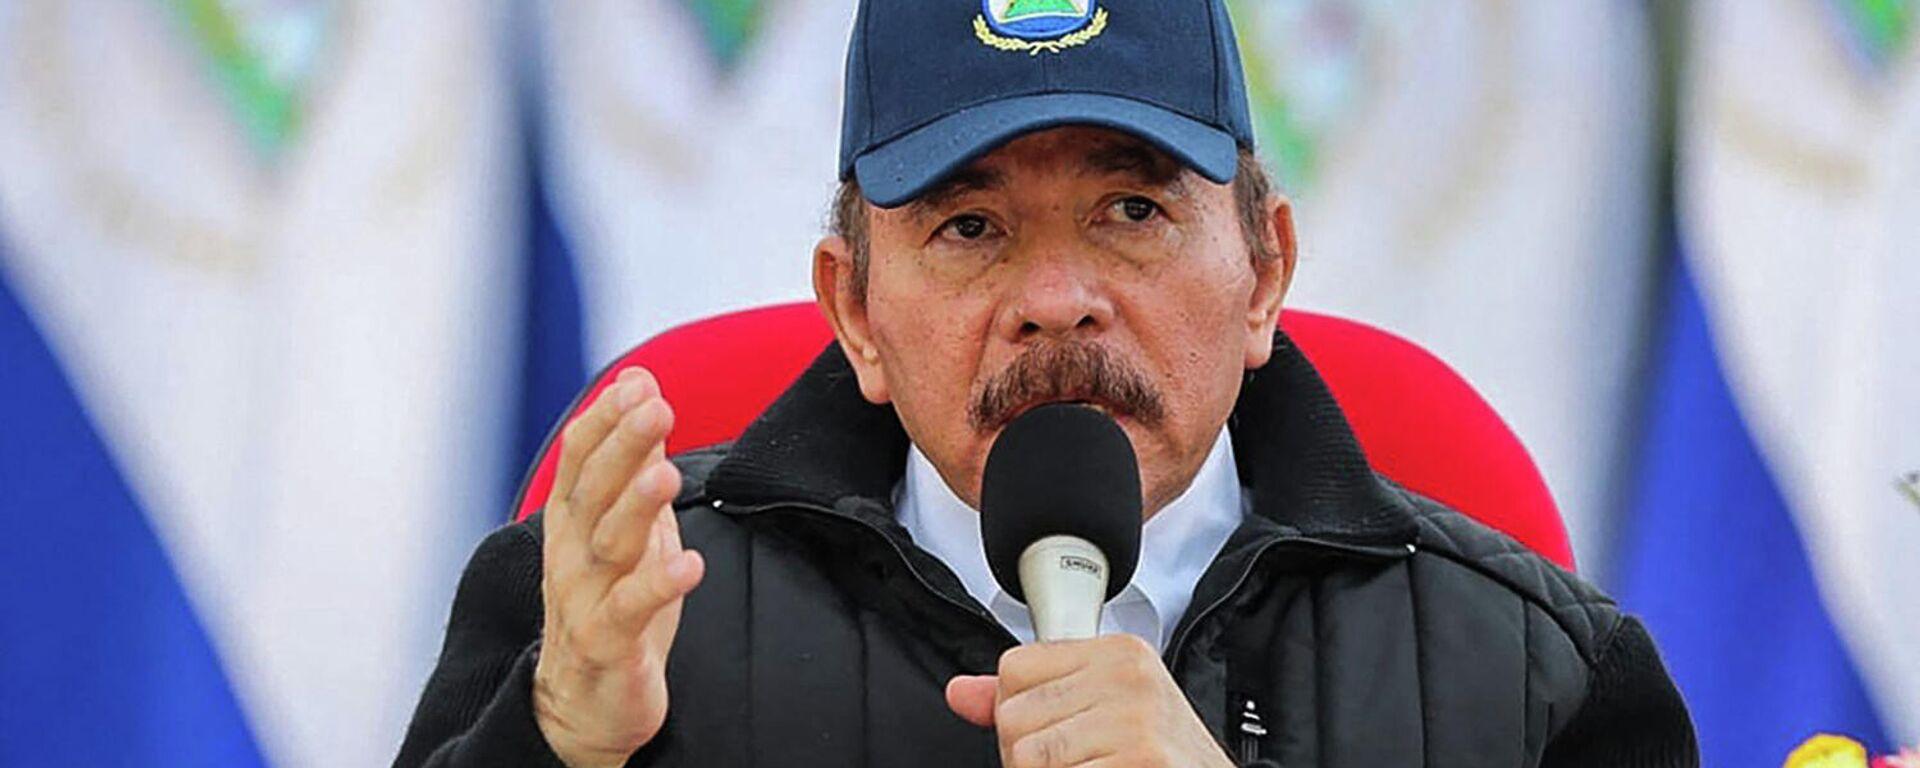 Daniel Ortega, presidente de Nicaragua - Sputnik Mundo, 1920, 07.09.2021